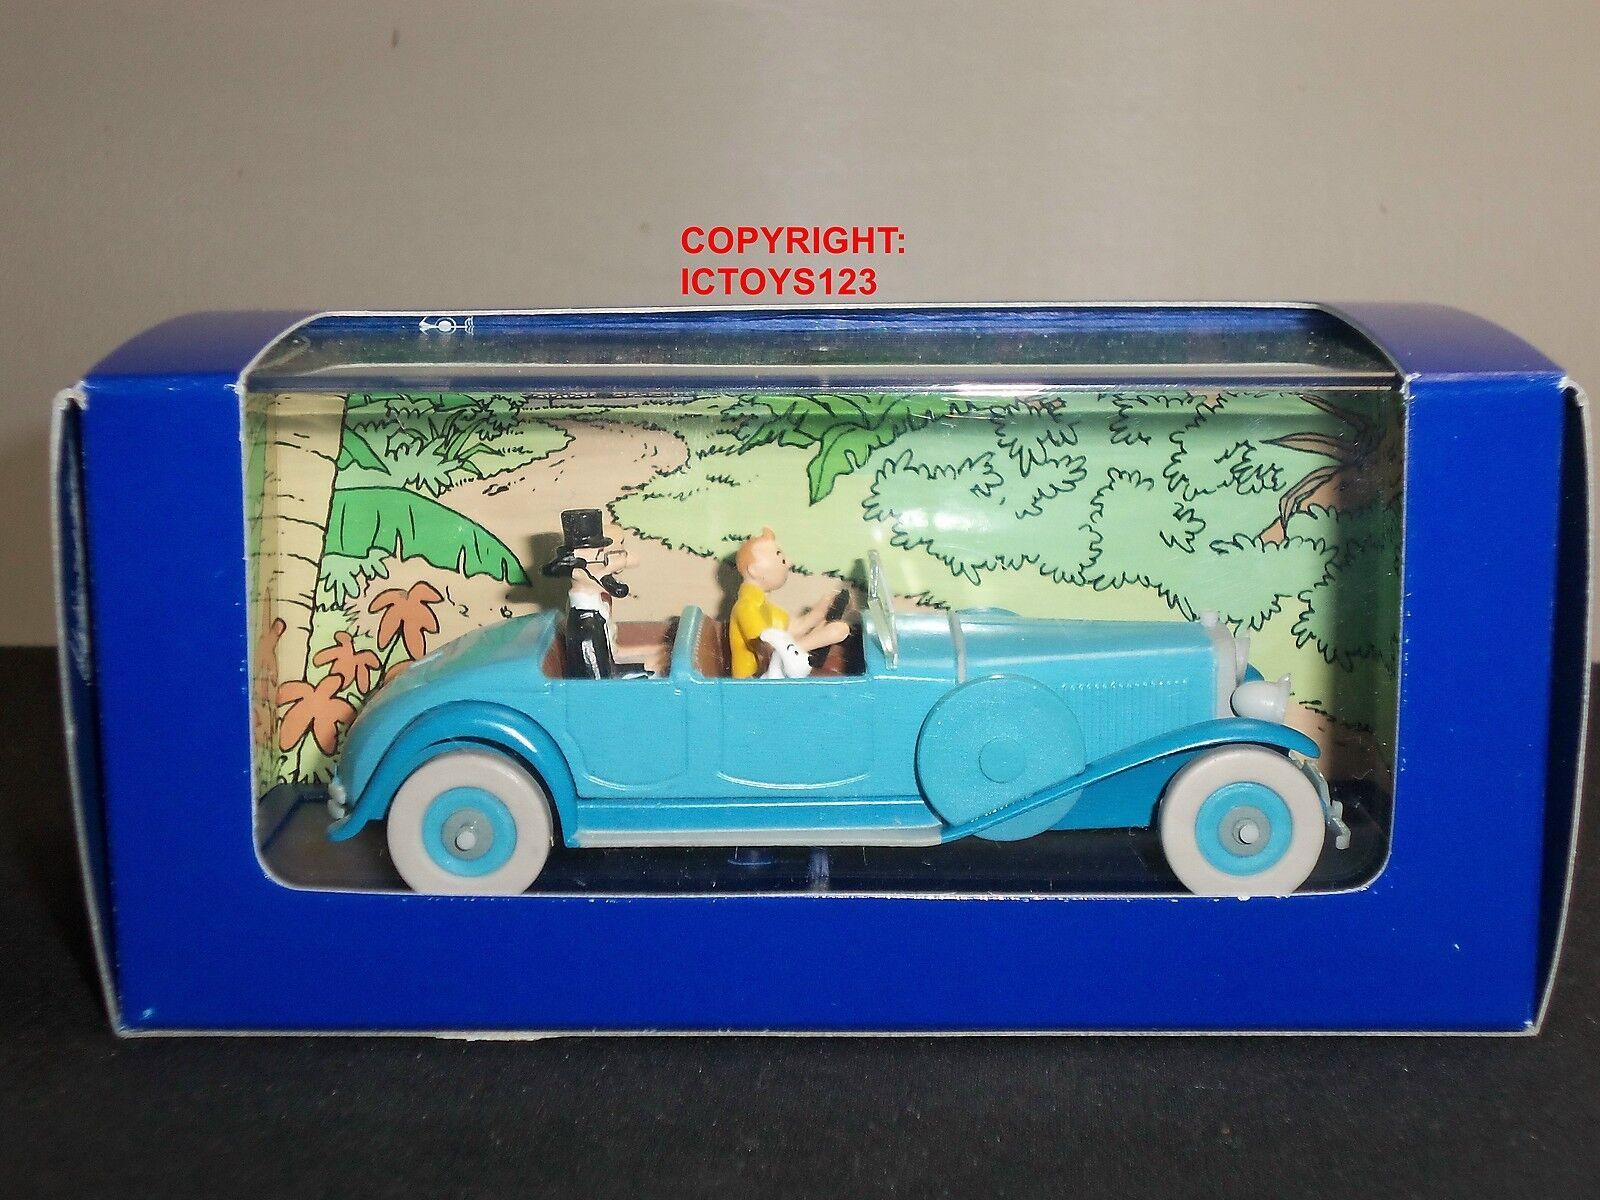 TINTIN NO.5 LES CIGARES DU PHARAON COMIC blueE LINCOLN TORPEDO GRAND SPORTS CAR